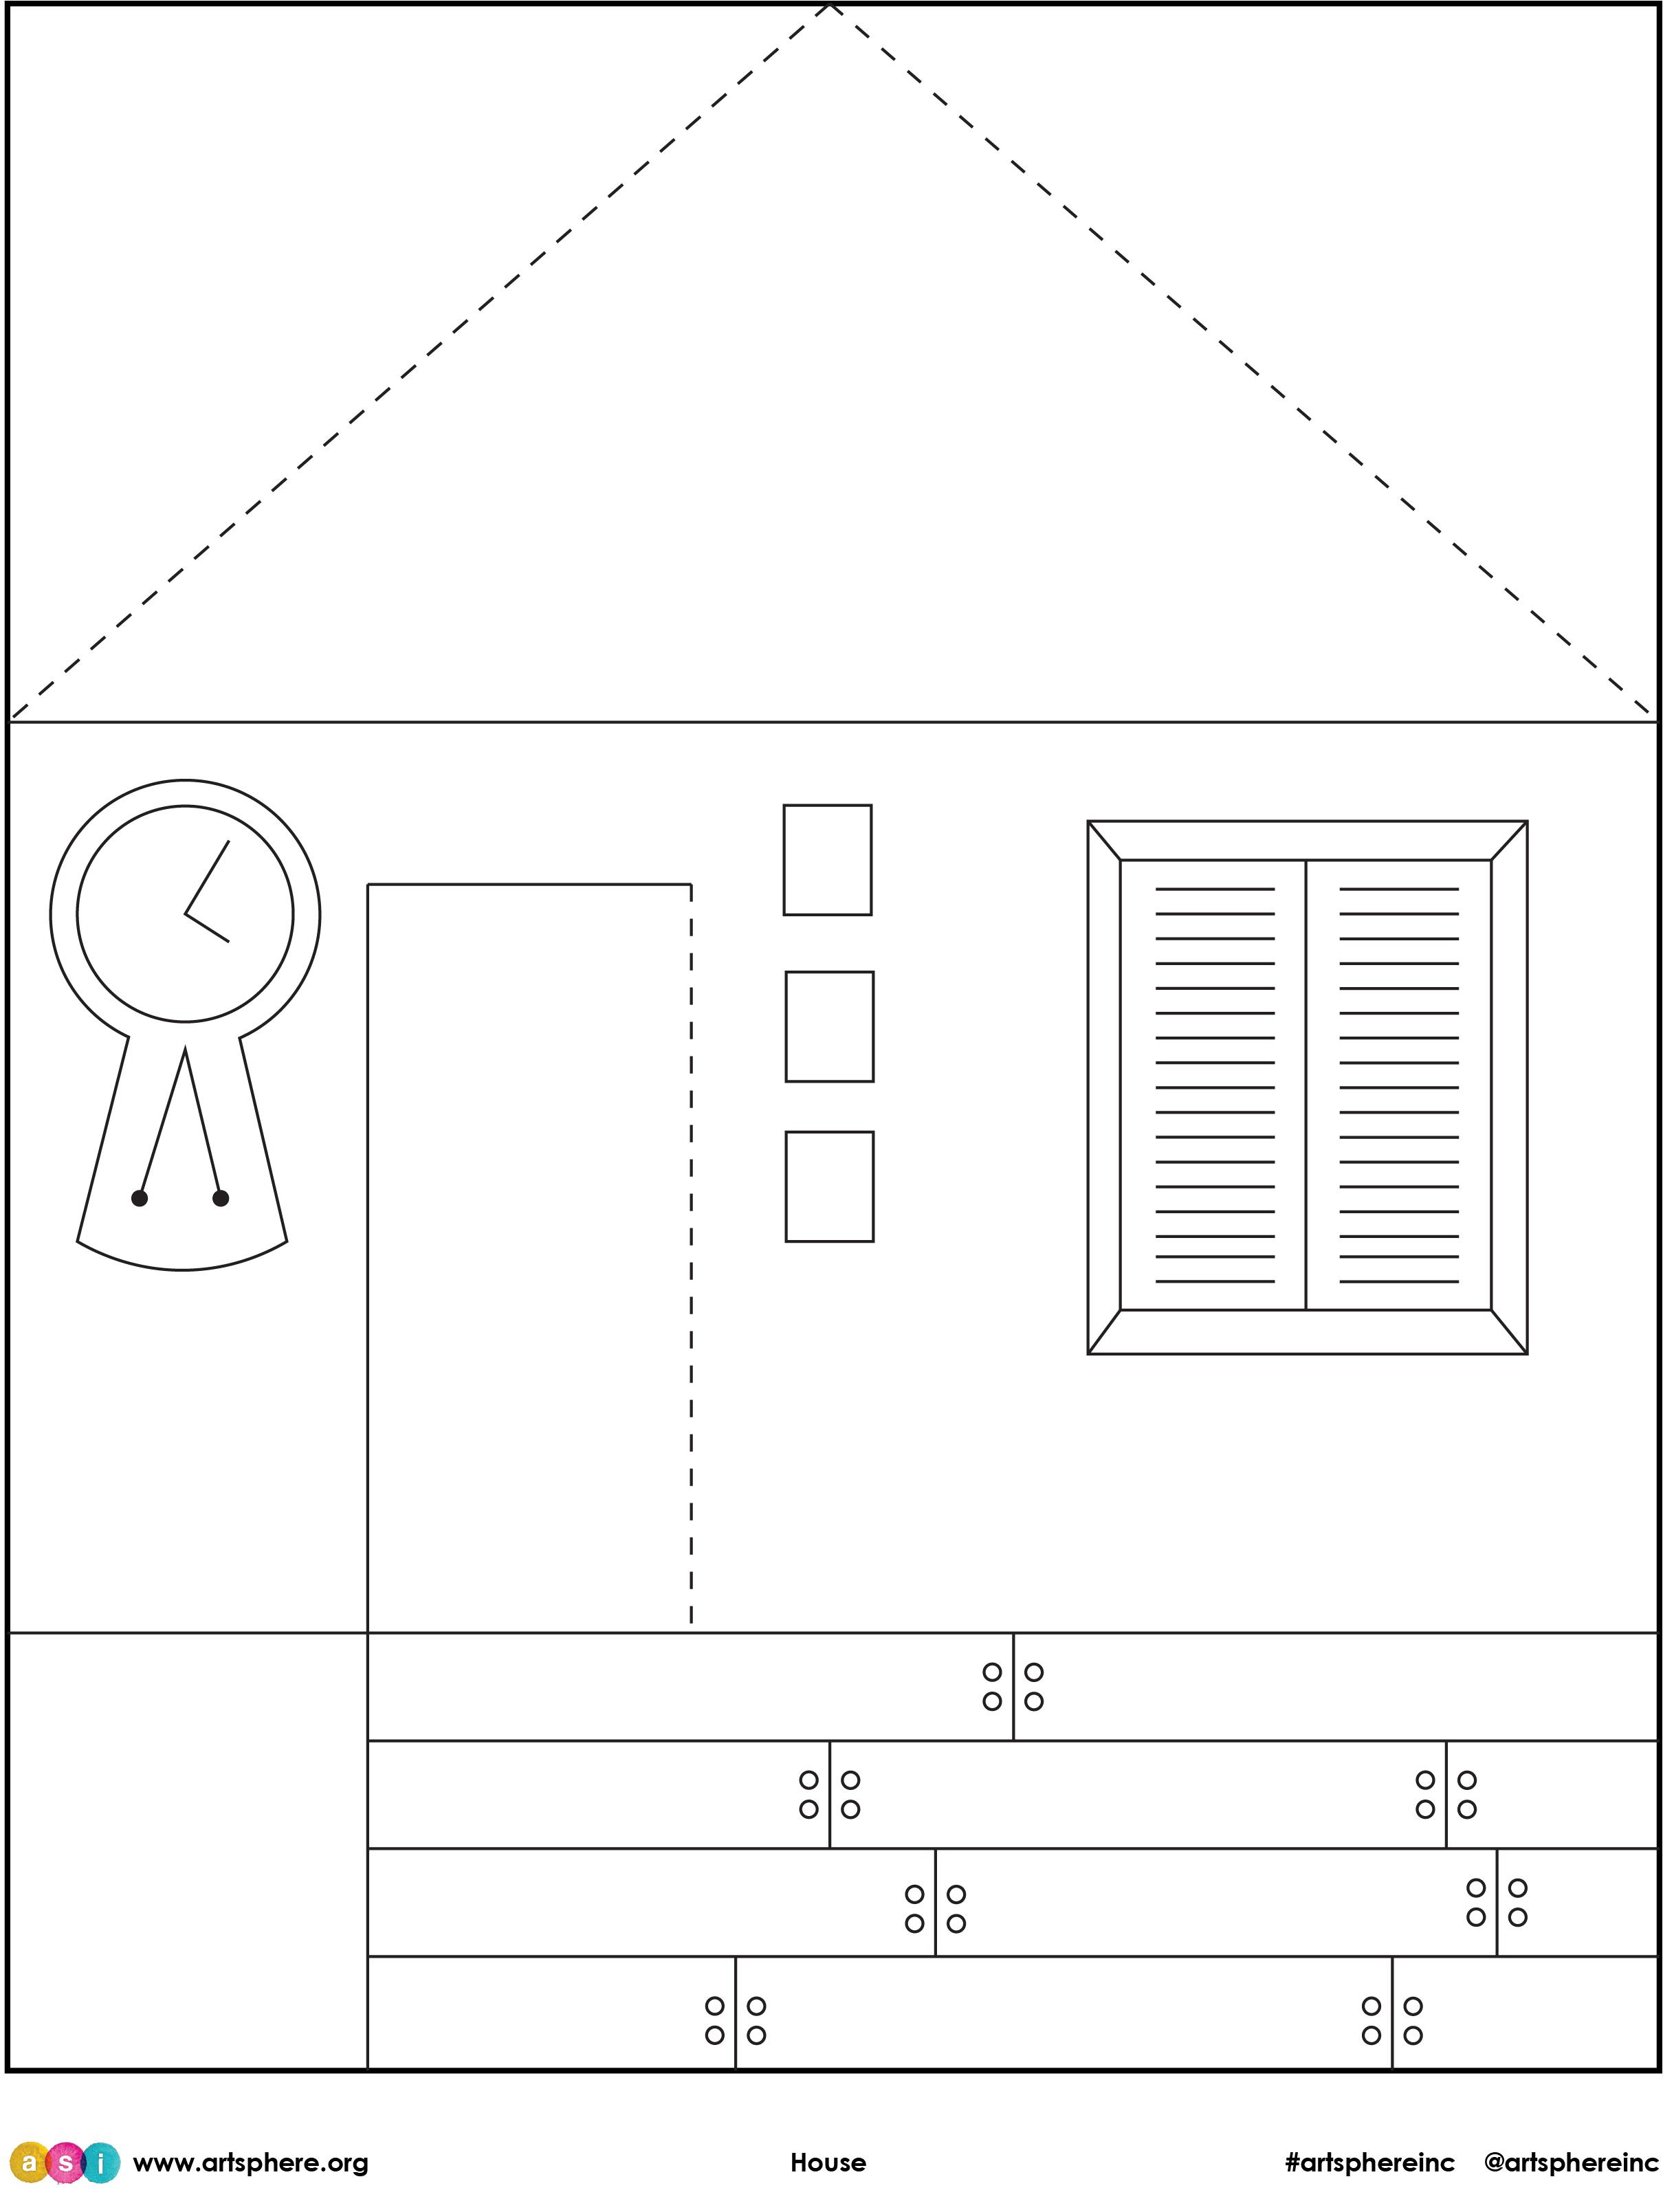 Free Lesson Plan: House Handout